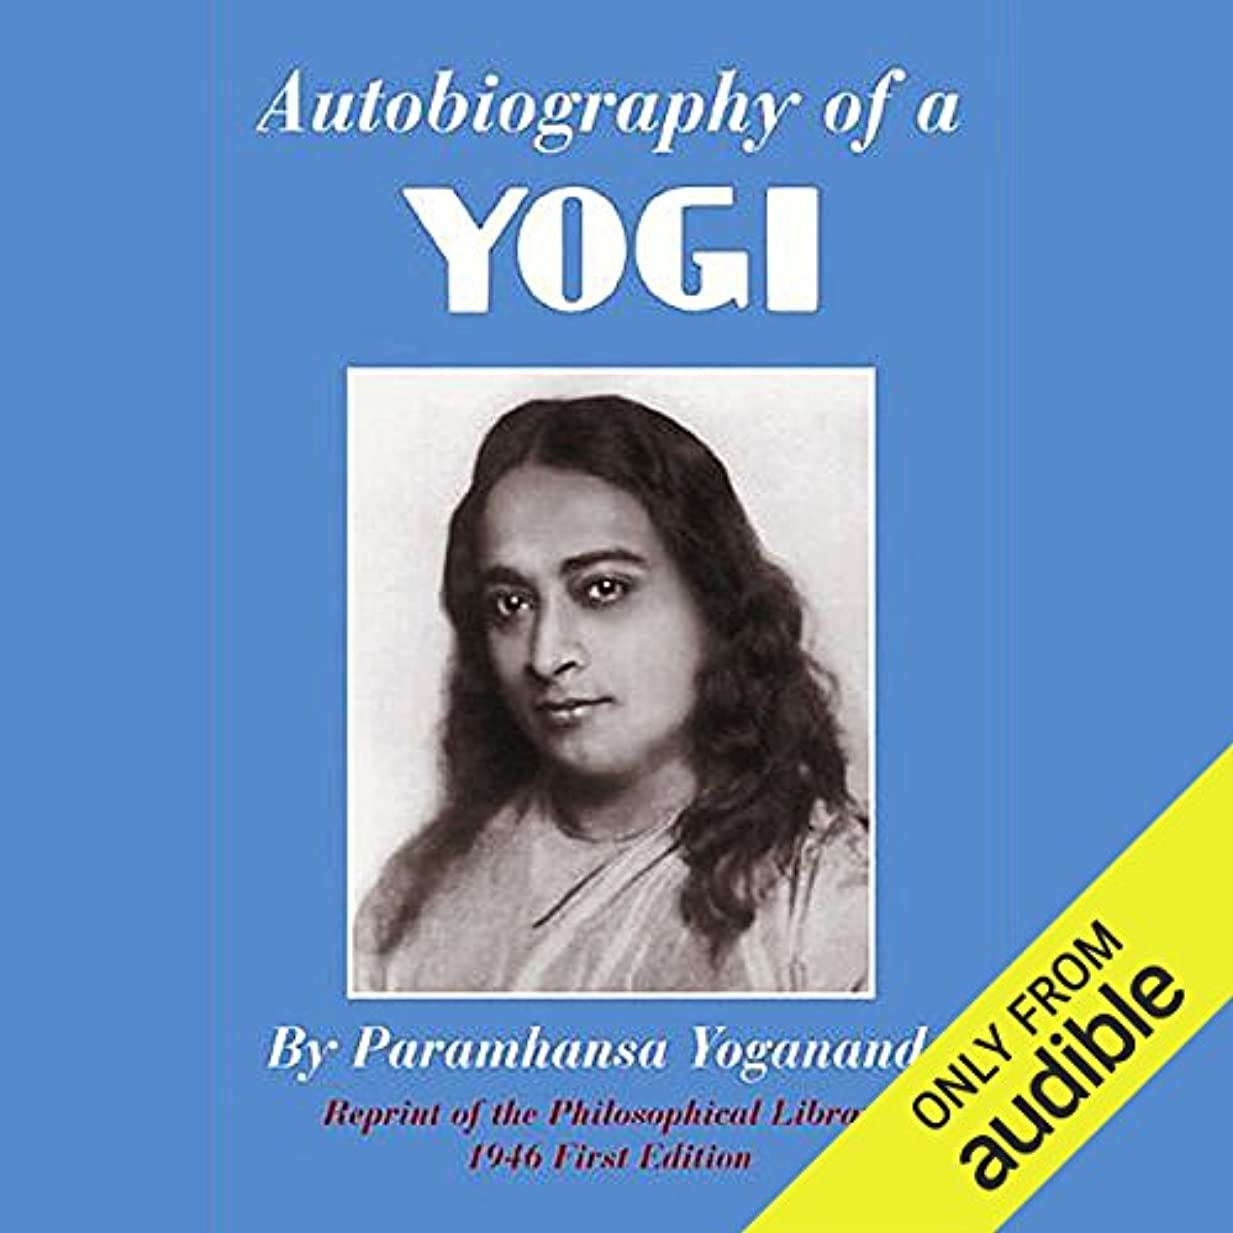 講堂移行支配的Autobiography of a Yogi